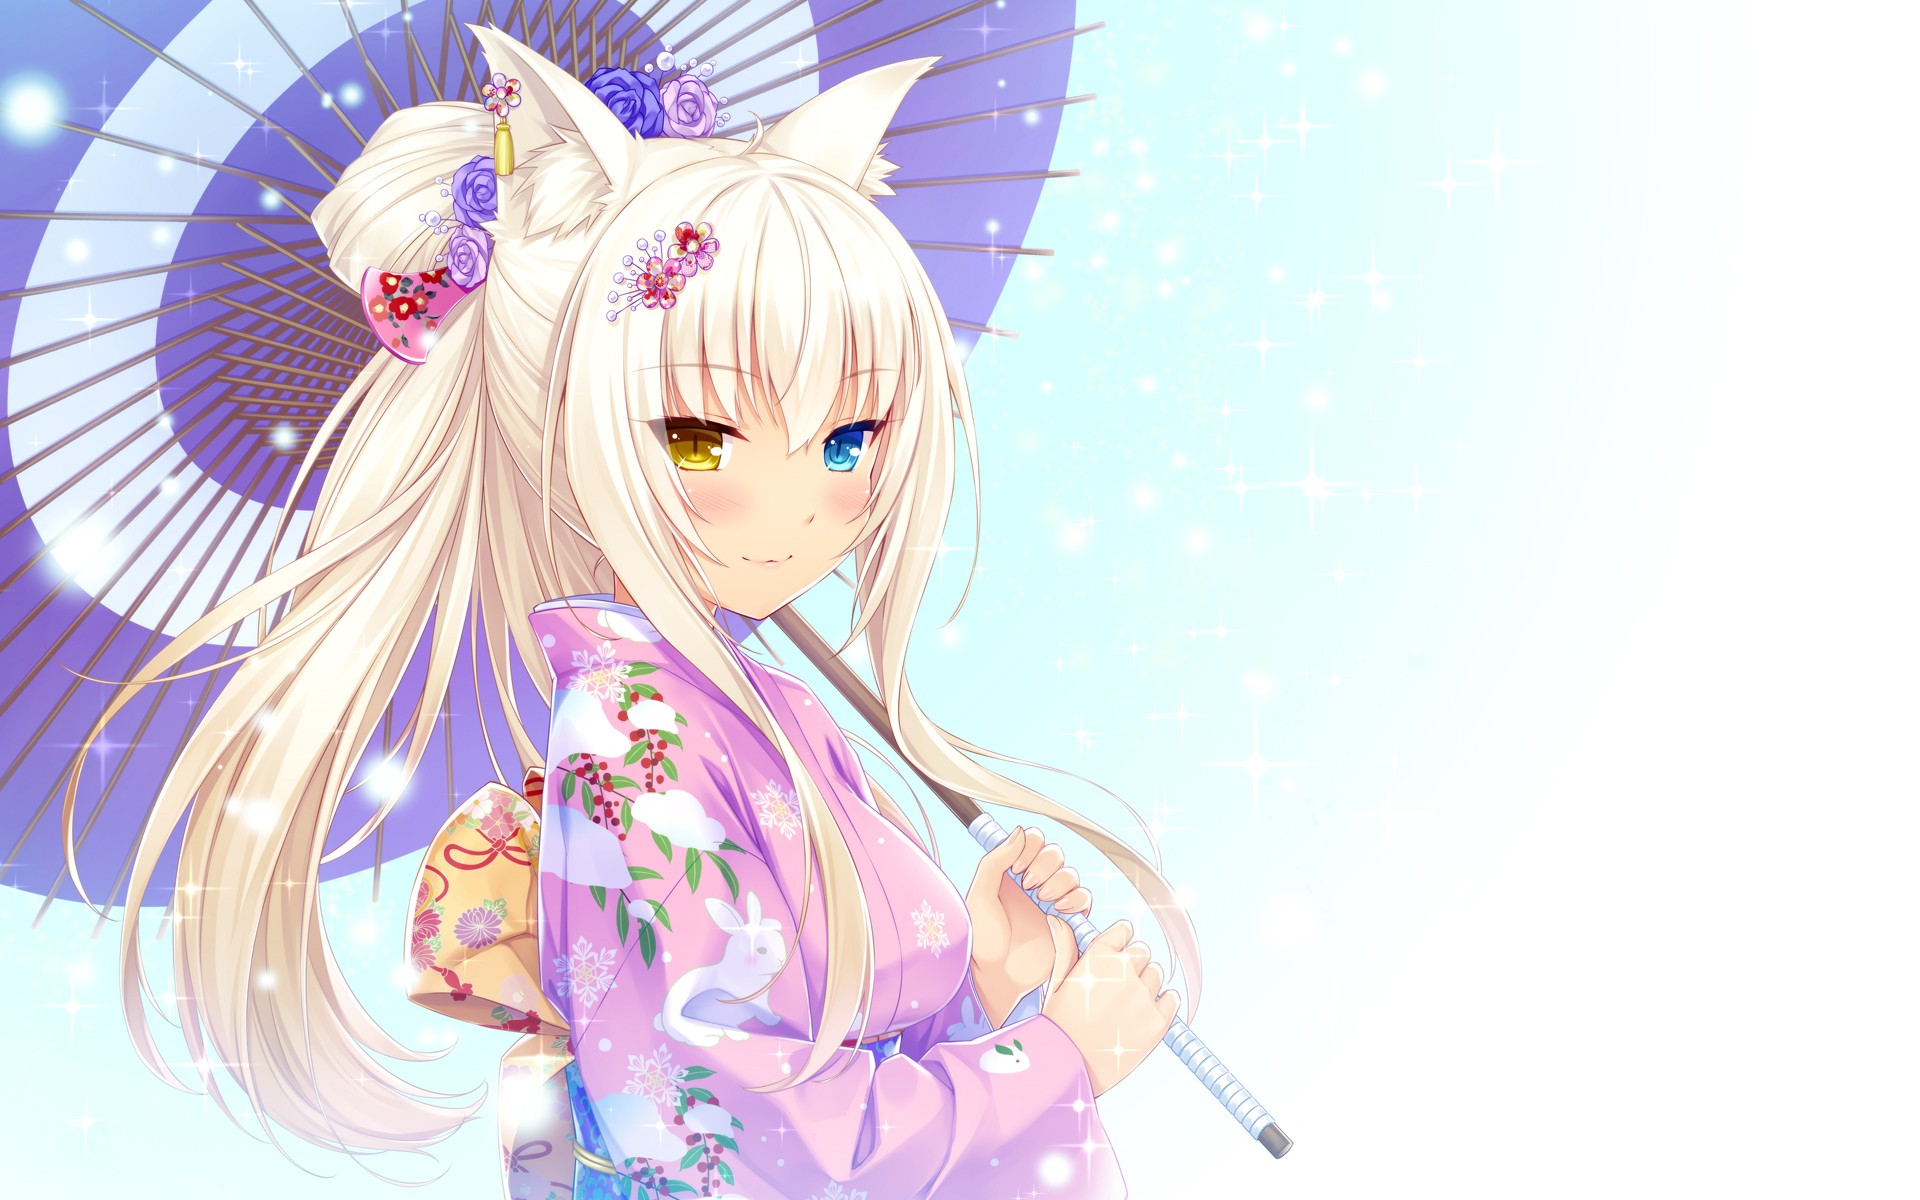 Anime 1920x1200 anime girls anime cat girl umbrella Neko Para Coconut (Neko Para) heterochromia kimono animal ears